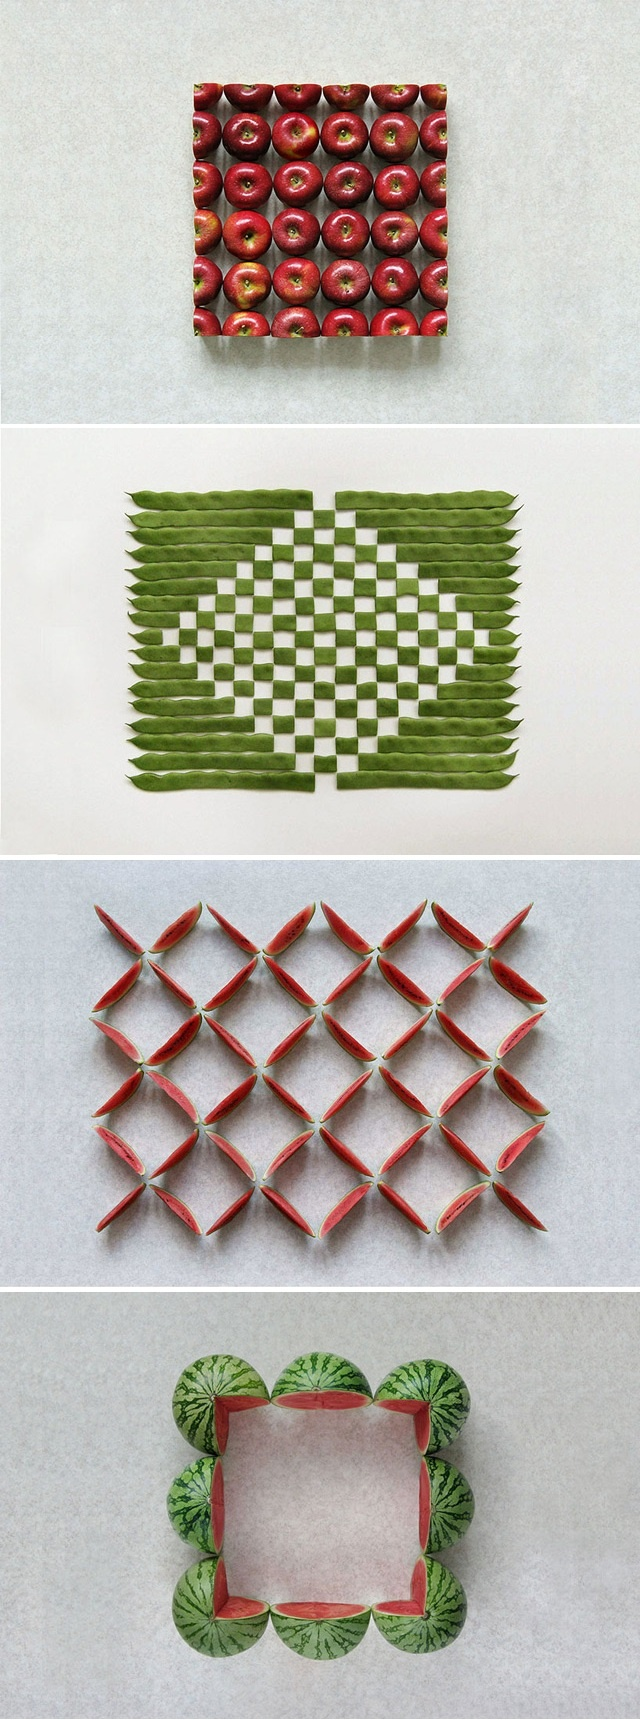 Geometric Food Art by Sakir Gokcebag